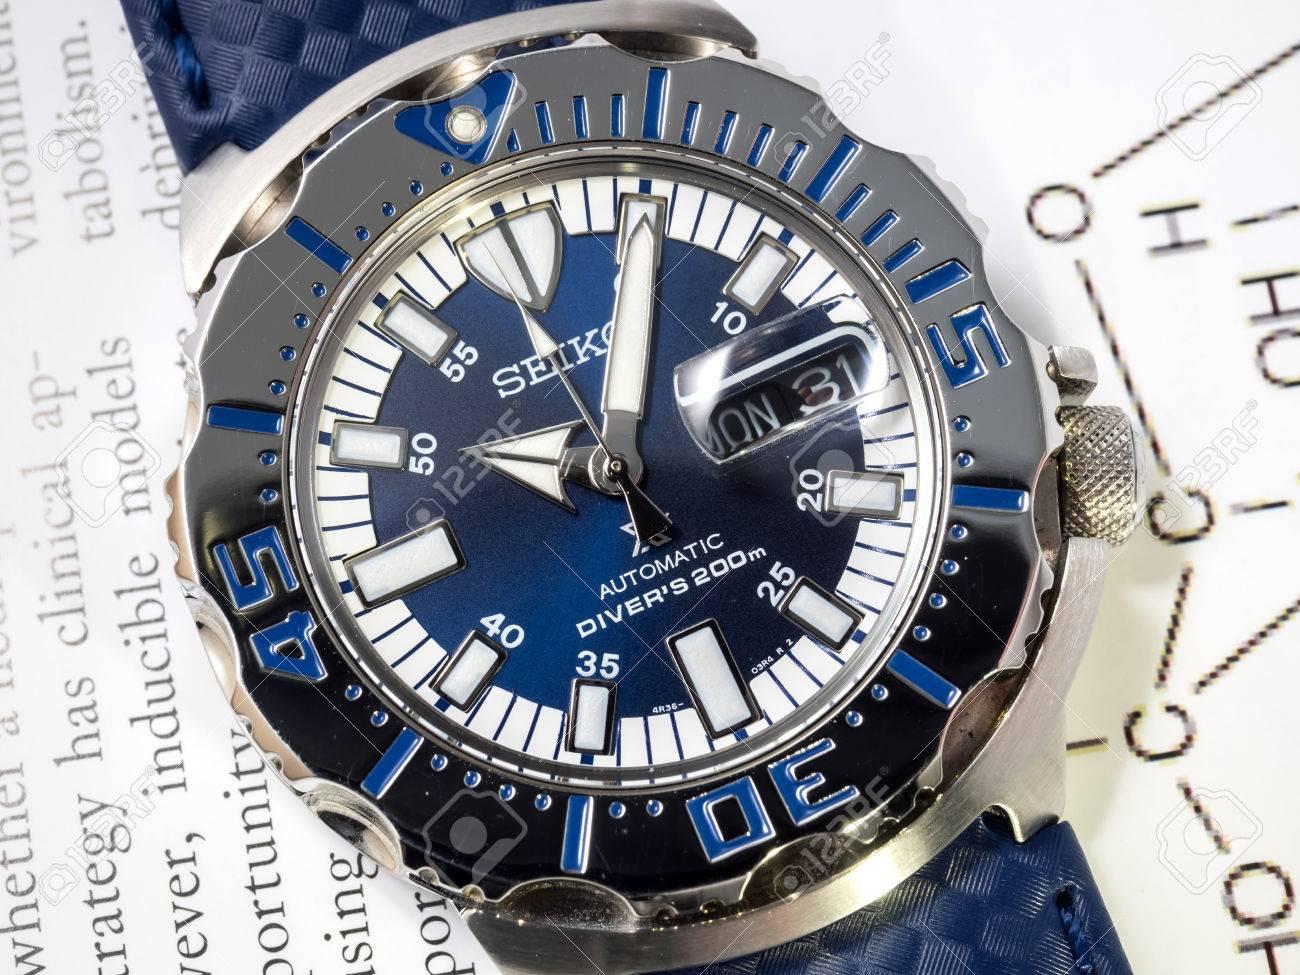 September Seiko Taucher Automatik Uhr Konigsblau Monster Begrenzte Modell